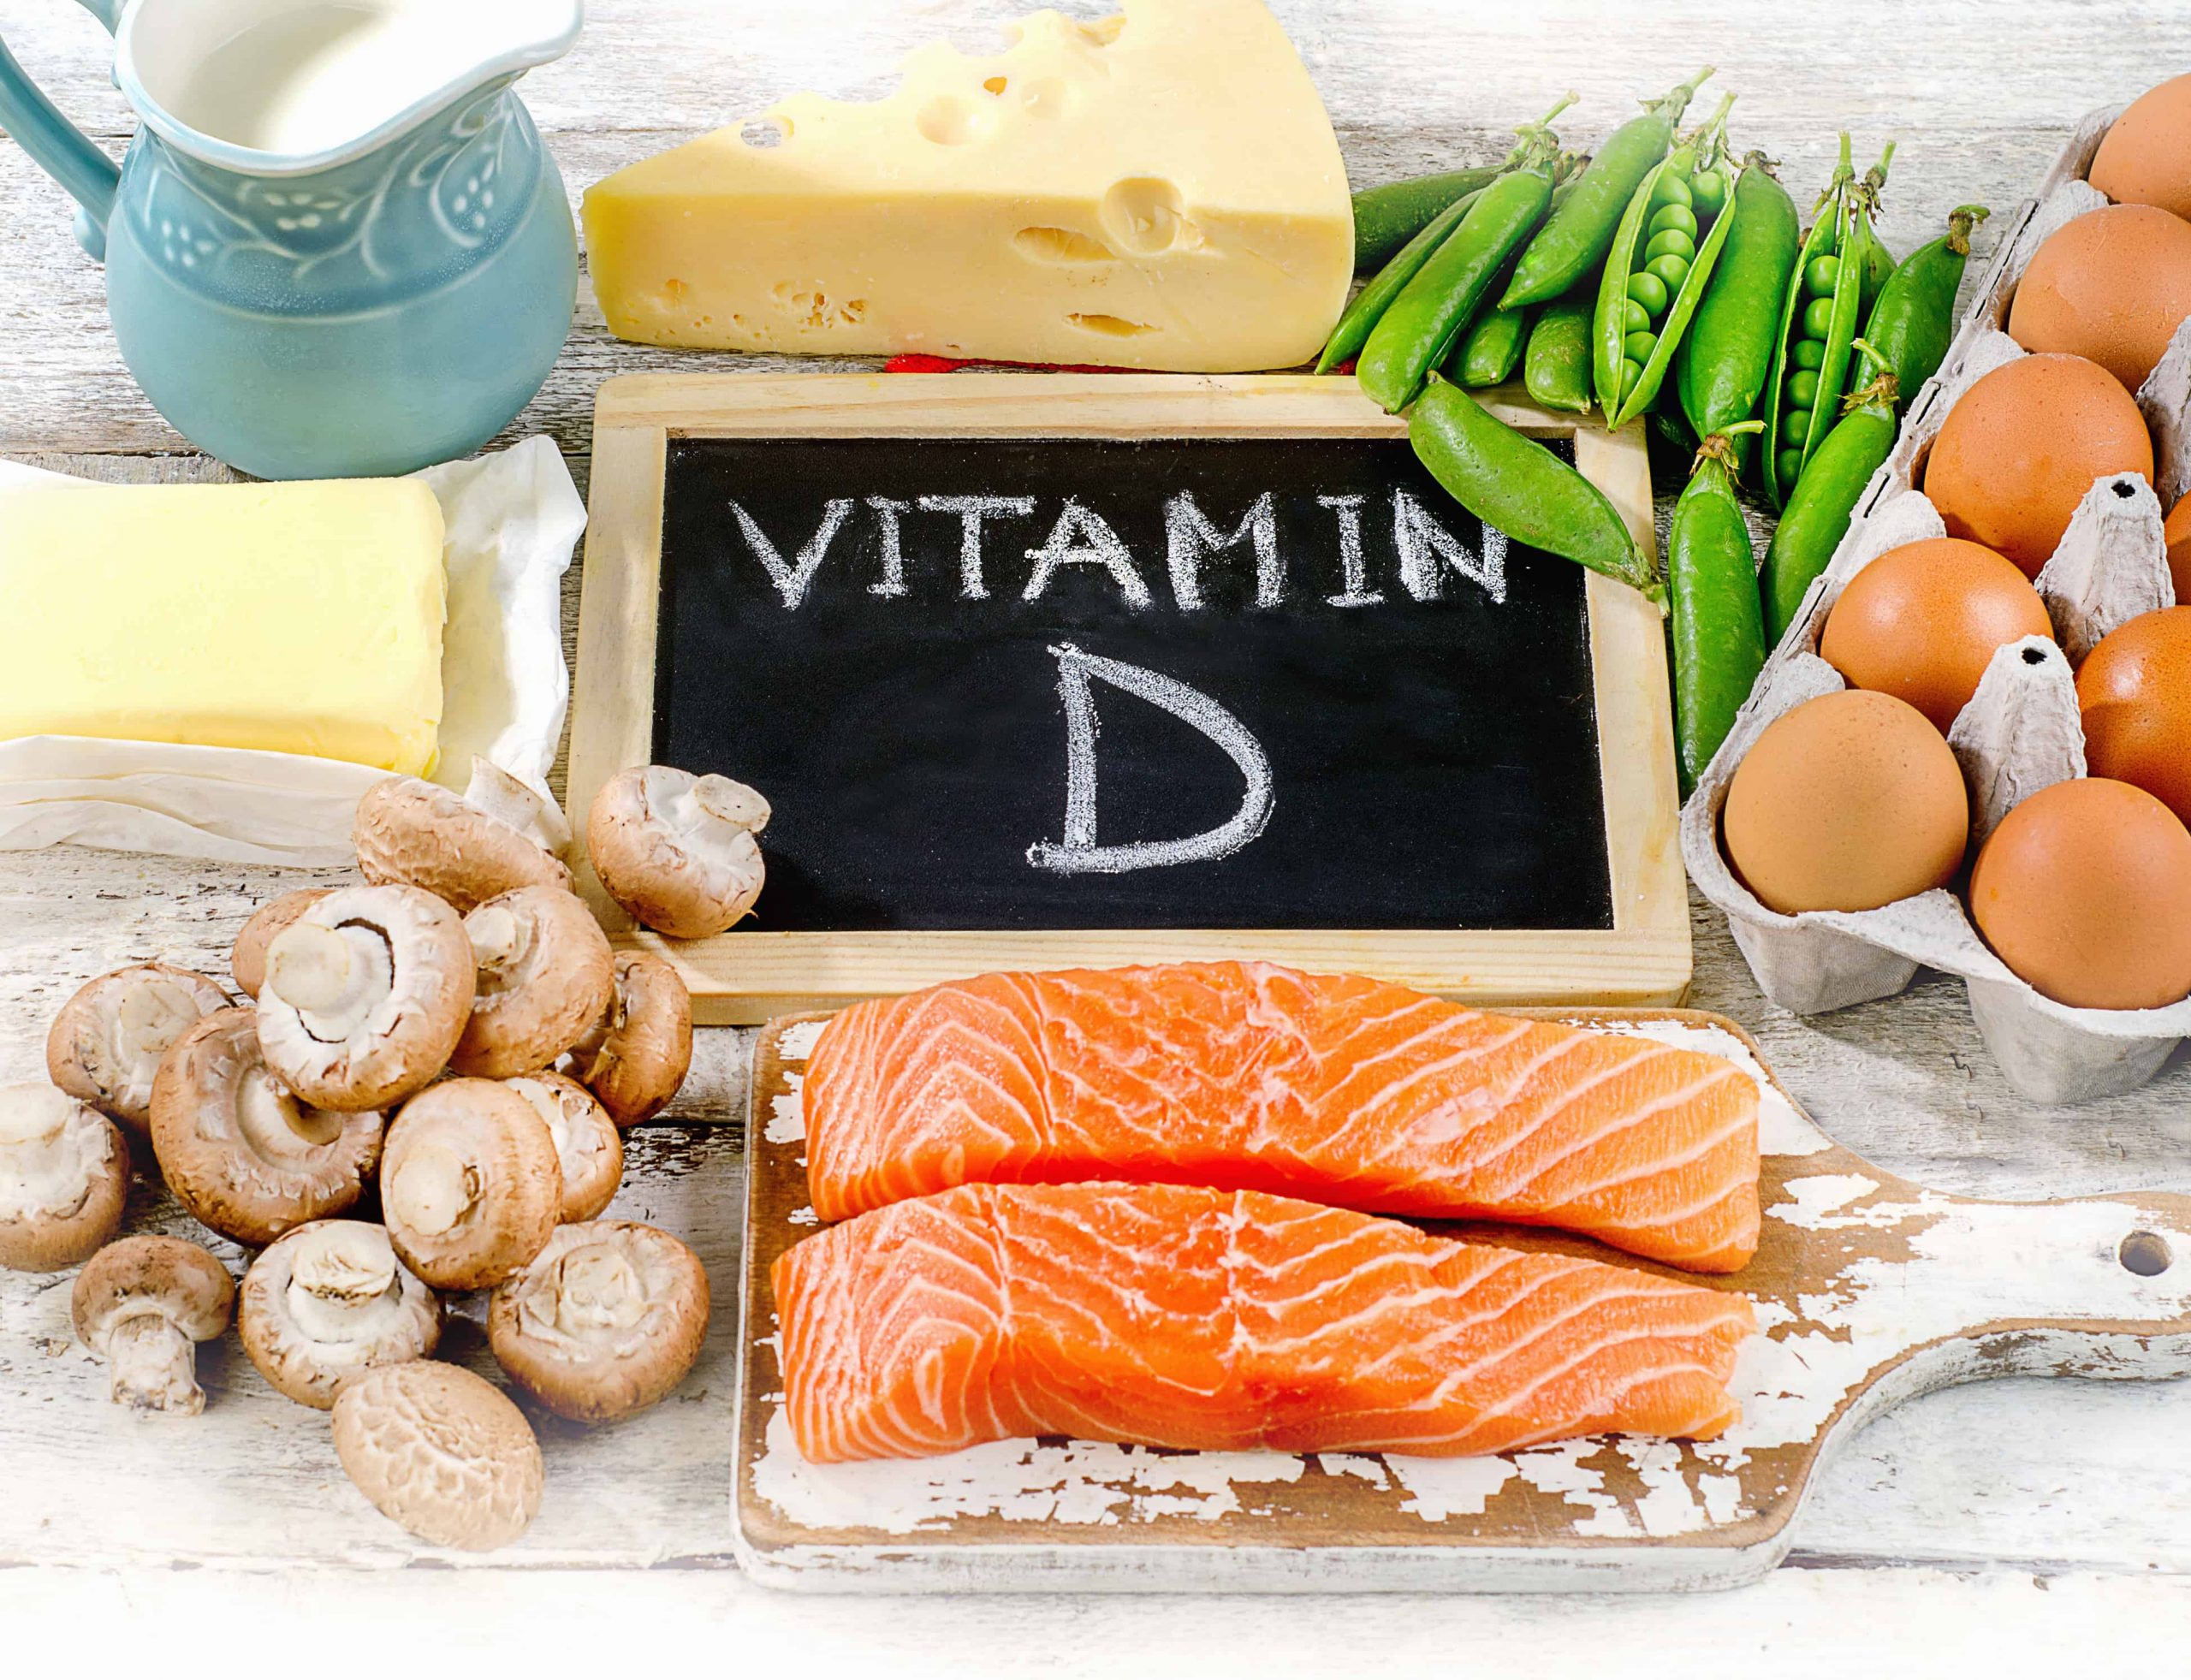 Deficiency of Vitamin D